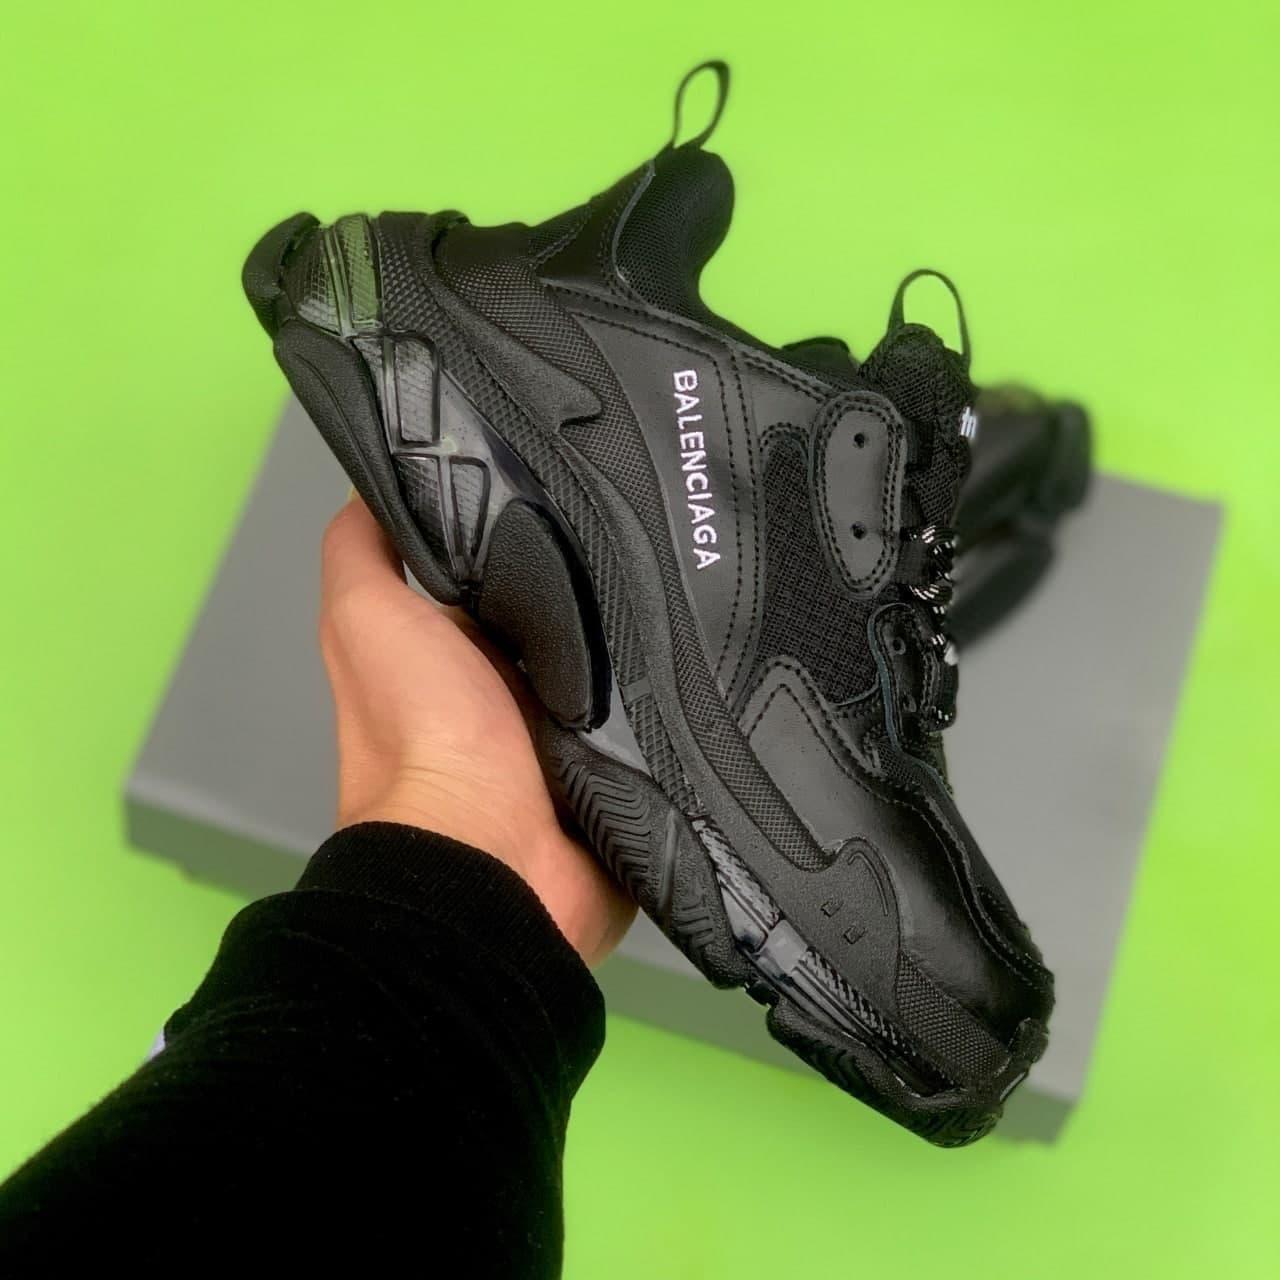 Жіночі Кросівки Balenciaga Triple S Clear Sole Leather Black